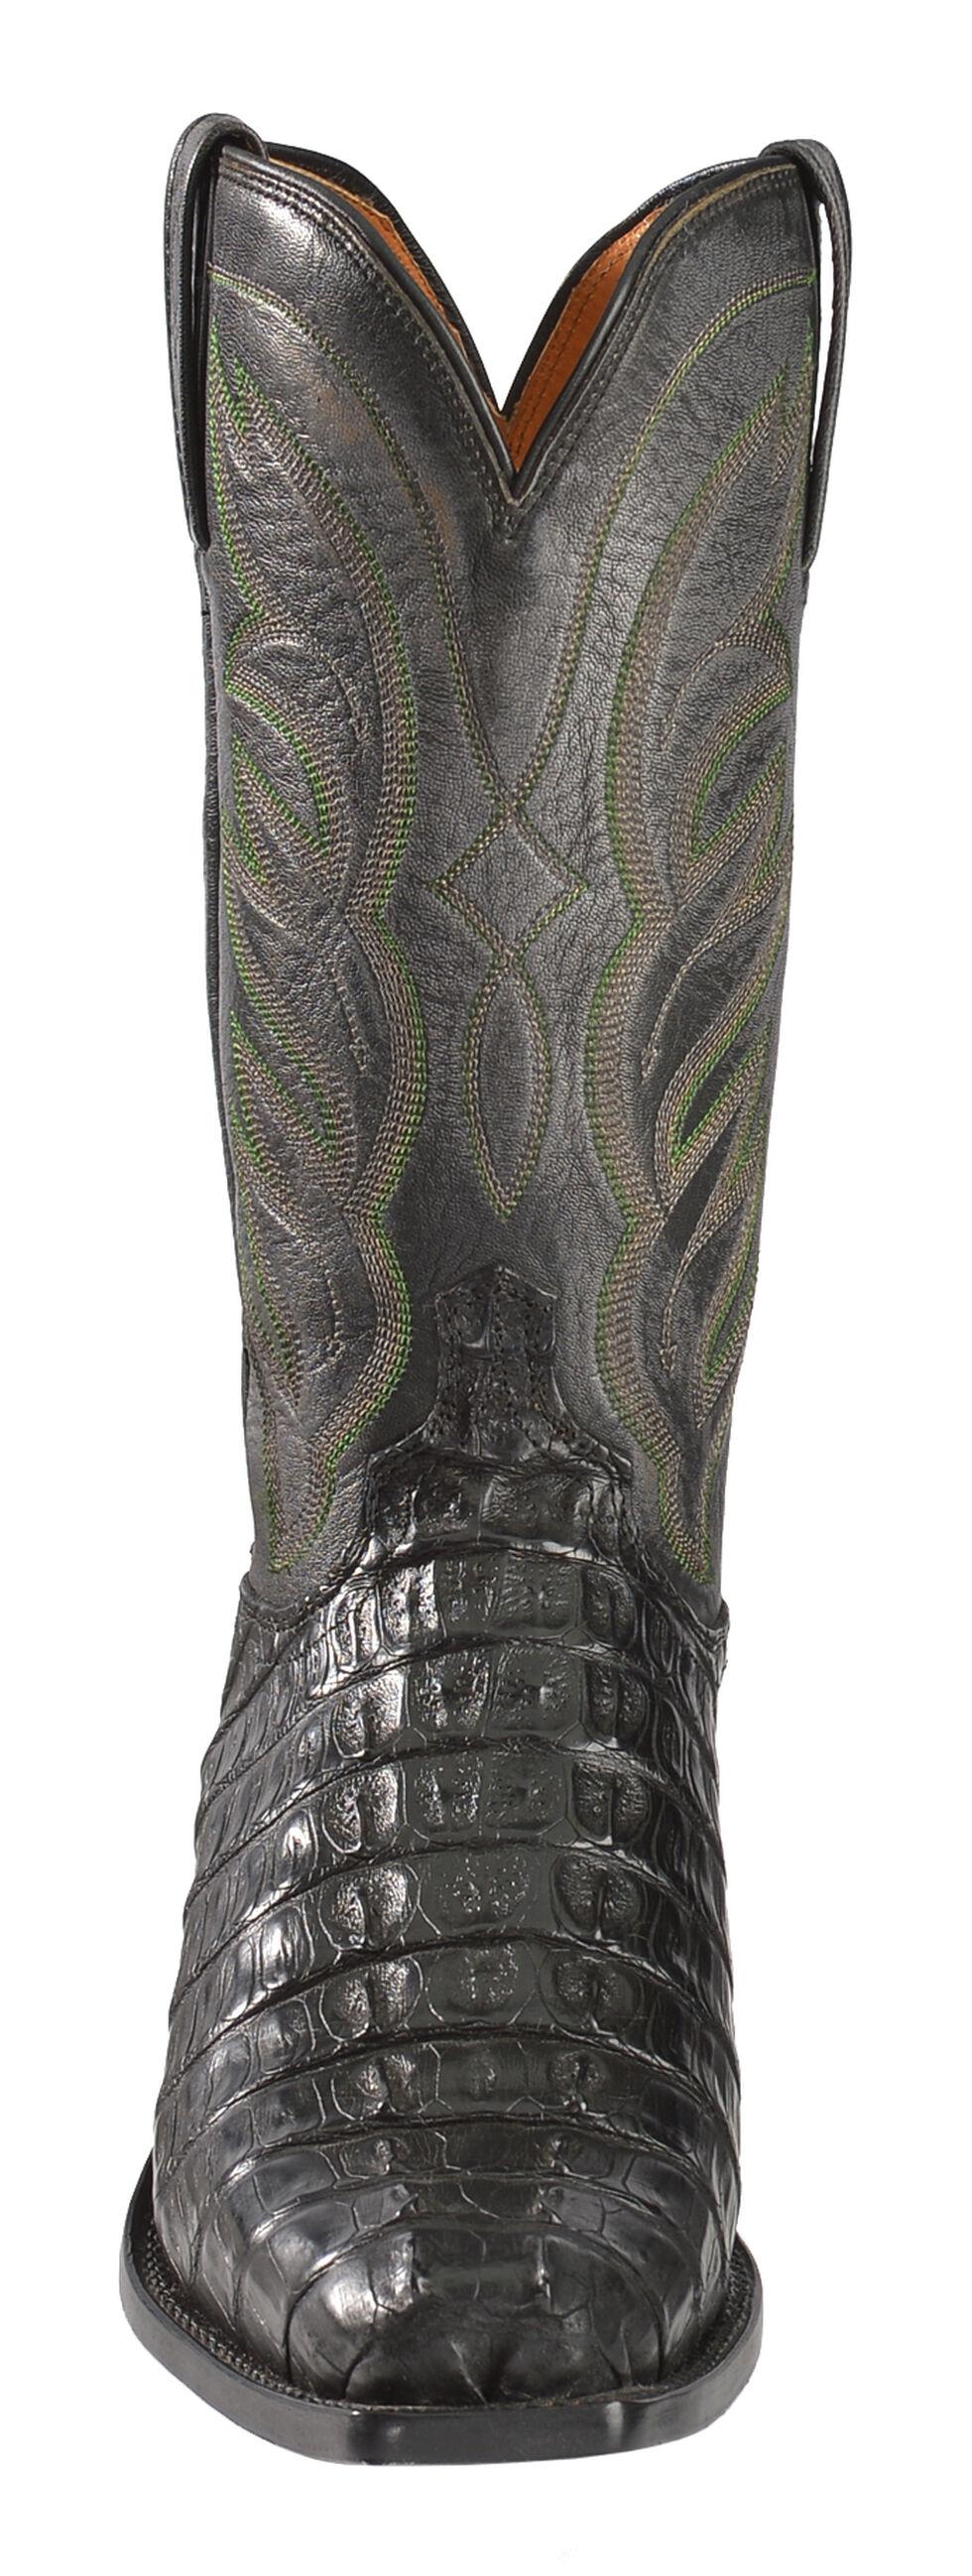 Lucchese Men's Handmade Landon Caiman Tail Cowboy Boots - Narrow Square Toe, Black, hi-res